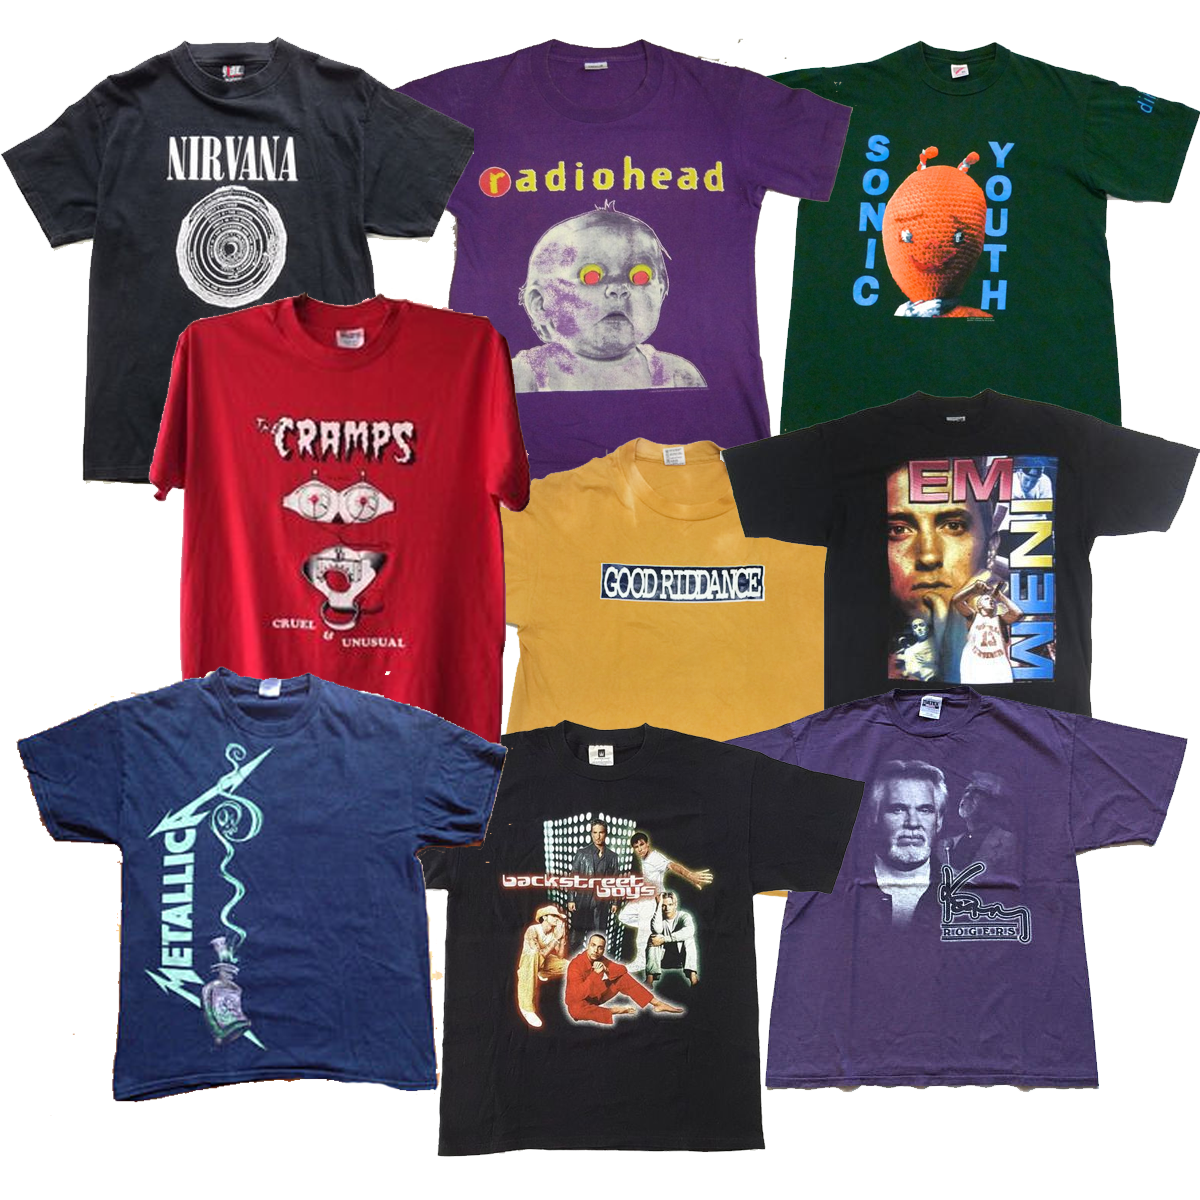 e7edeadb Dust Factory Vintage Wholesale Catalog - Clothing, Denim, T-shirts ...